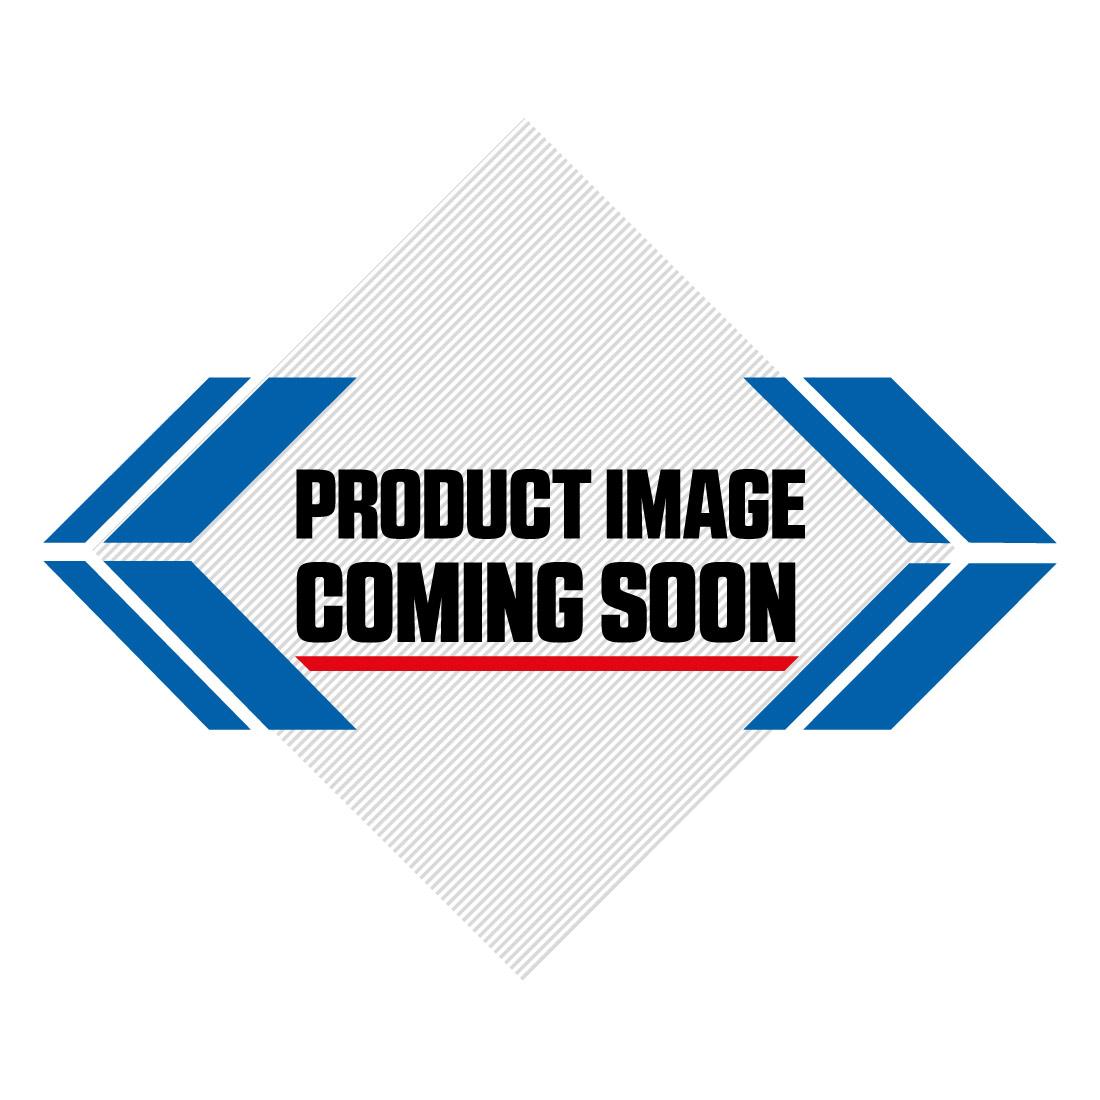 Honda Plastic Kit CR 125 (87-88) OEM Factory (1988) Image-4>